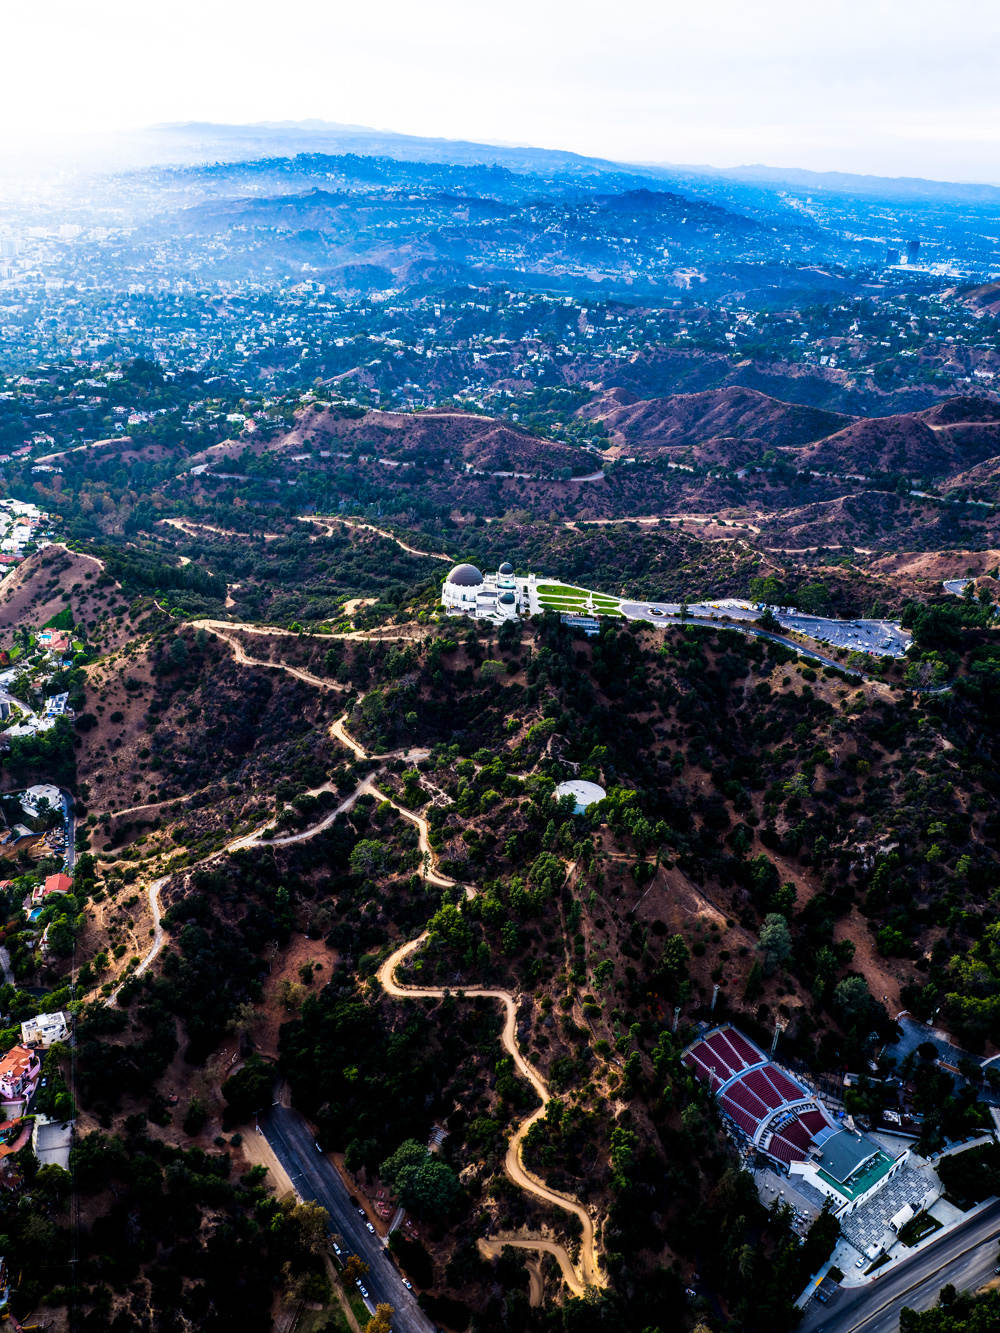 '2500 feet', Los Angeles, 2020